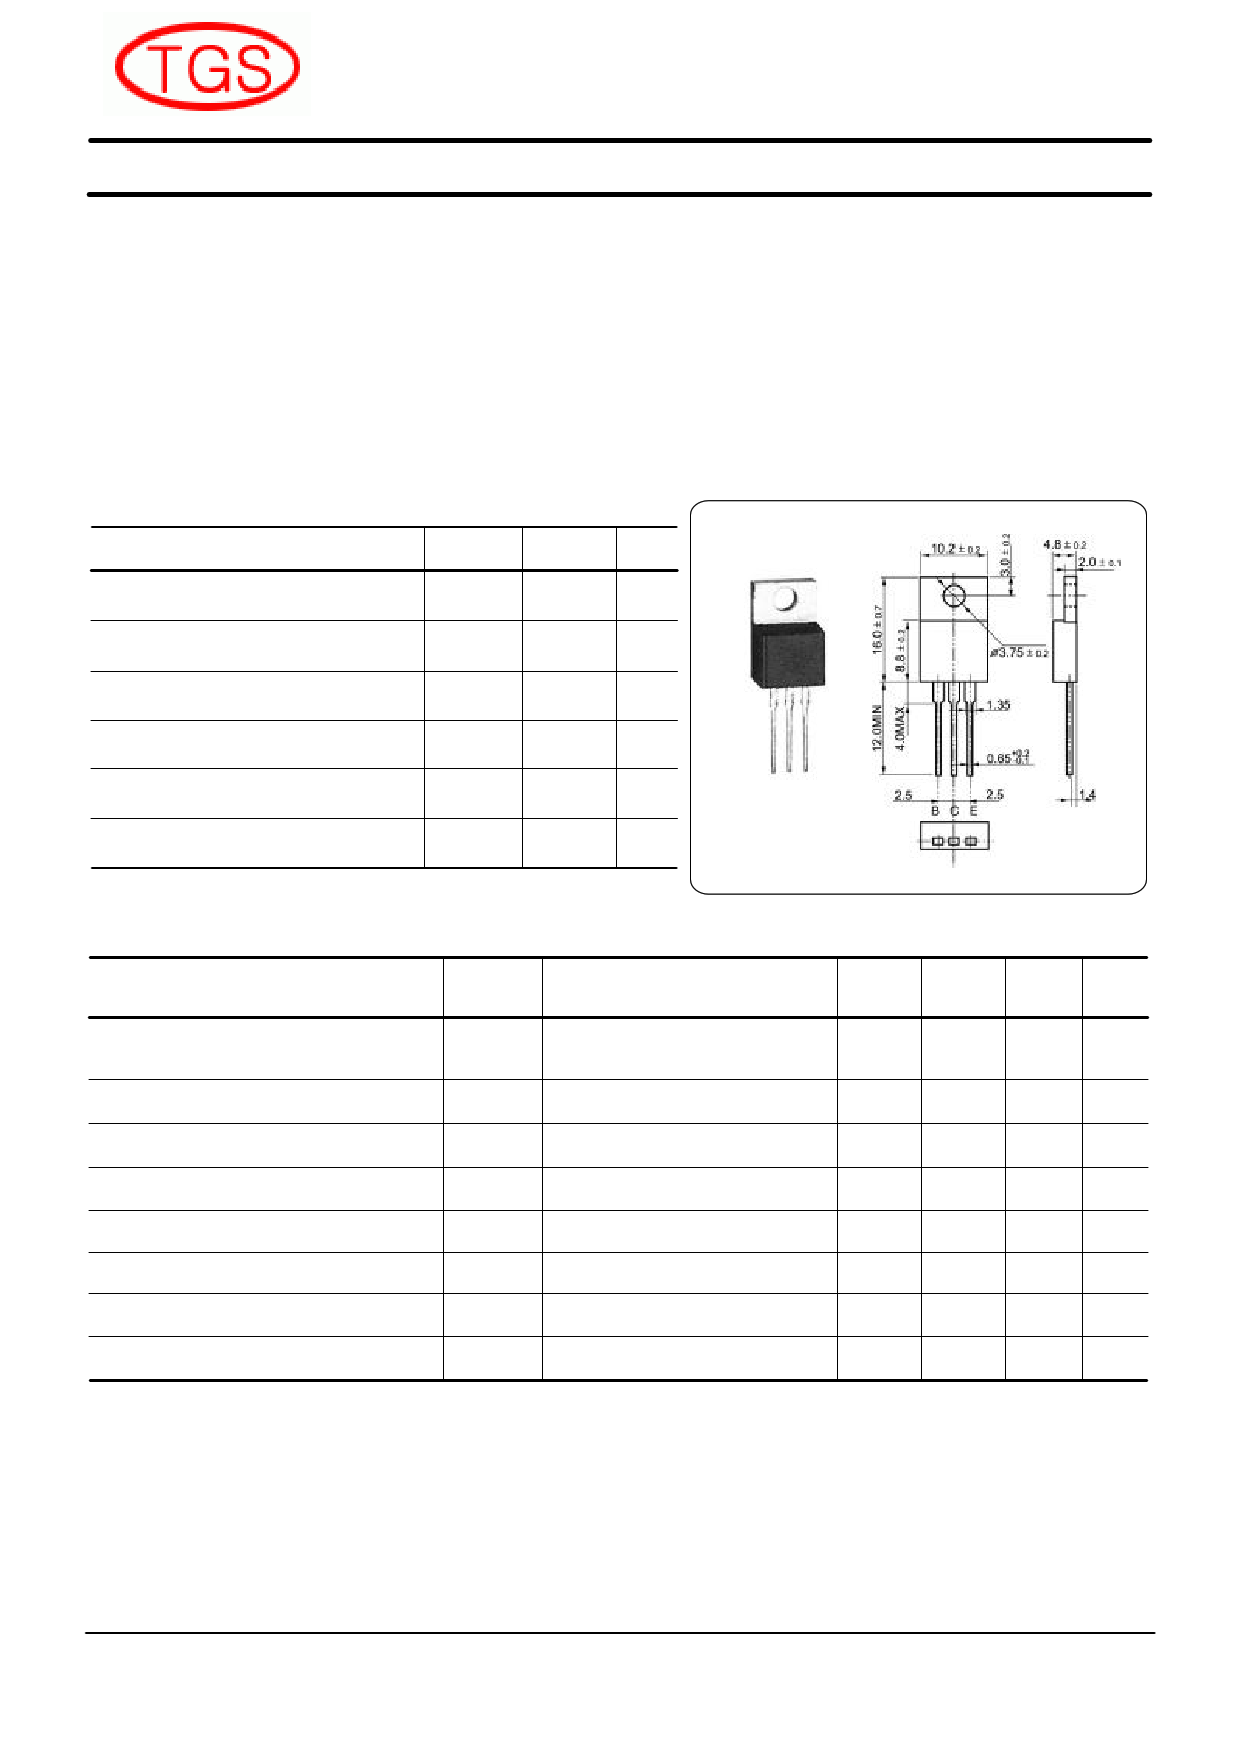 TS820-600T دیتاشیت PDF